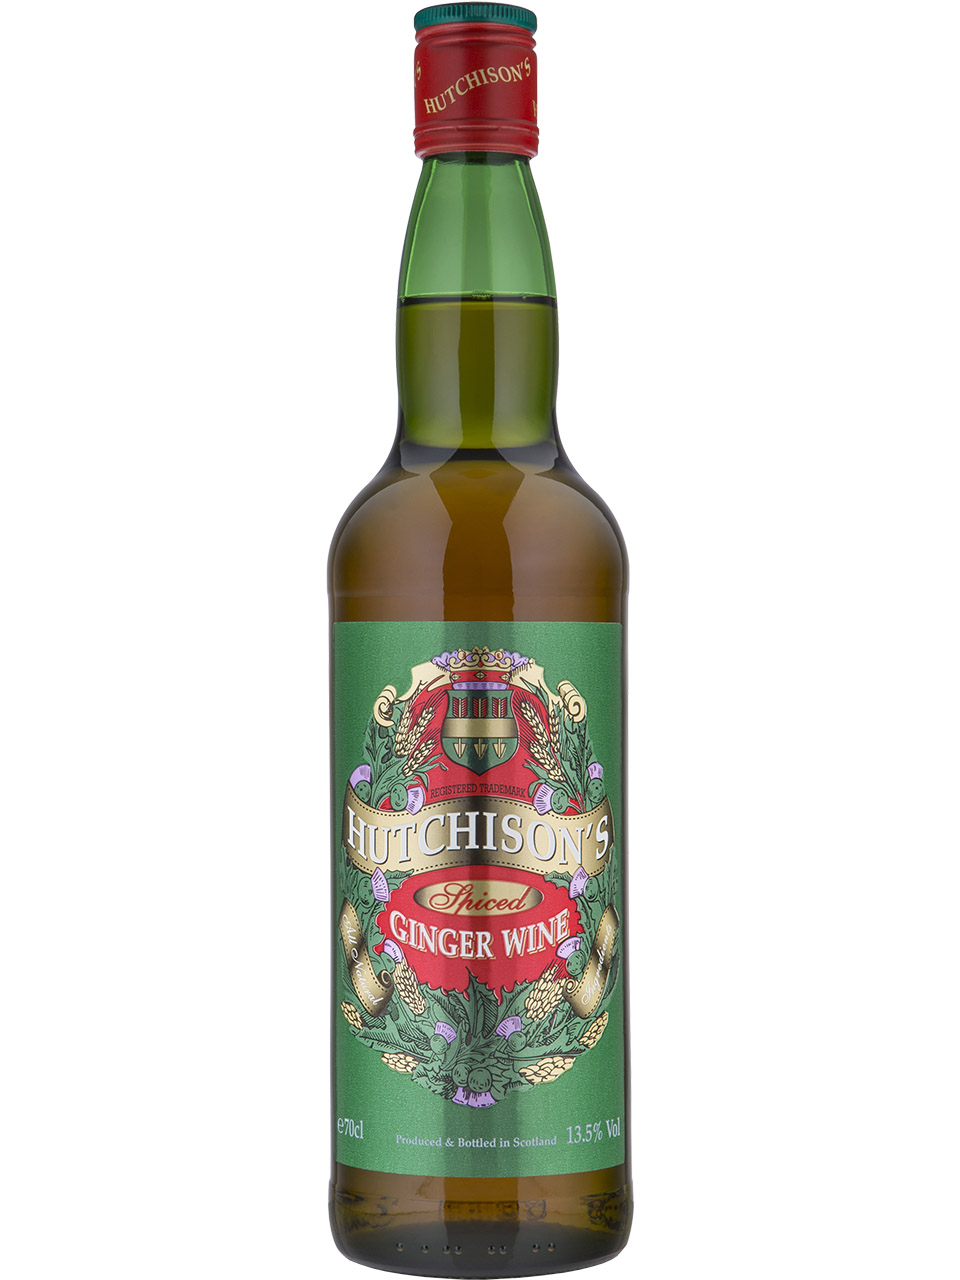 Hutchison's Ginger Wine